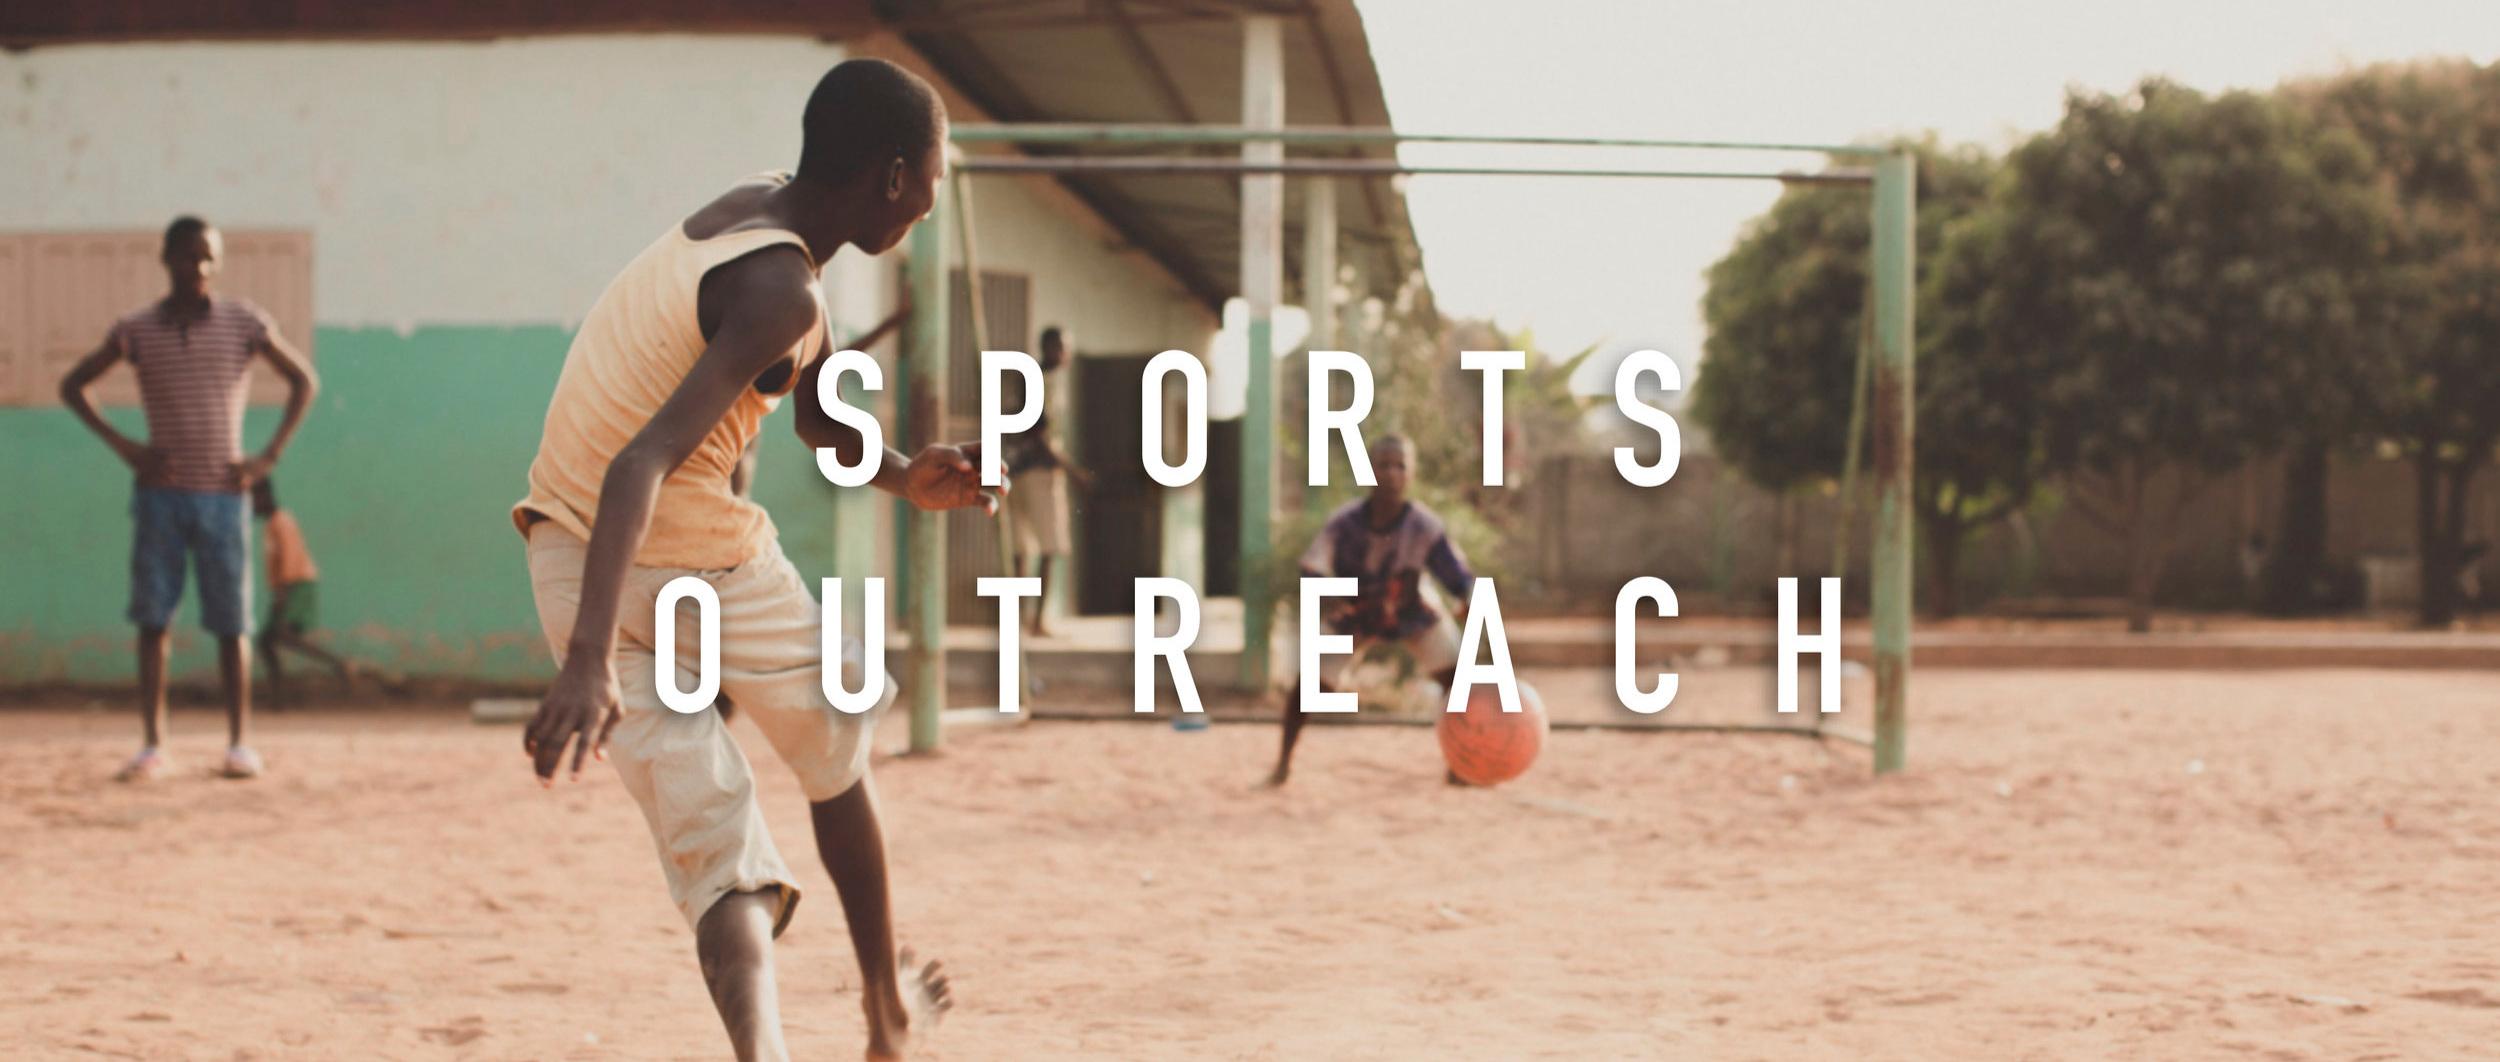 Africa+Sports+Outreach.jpg